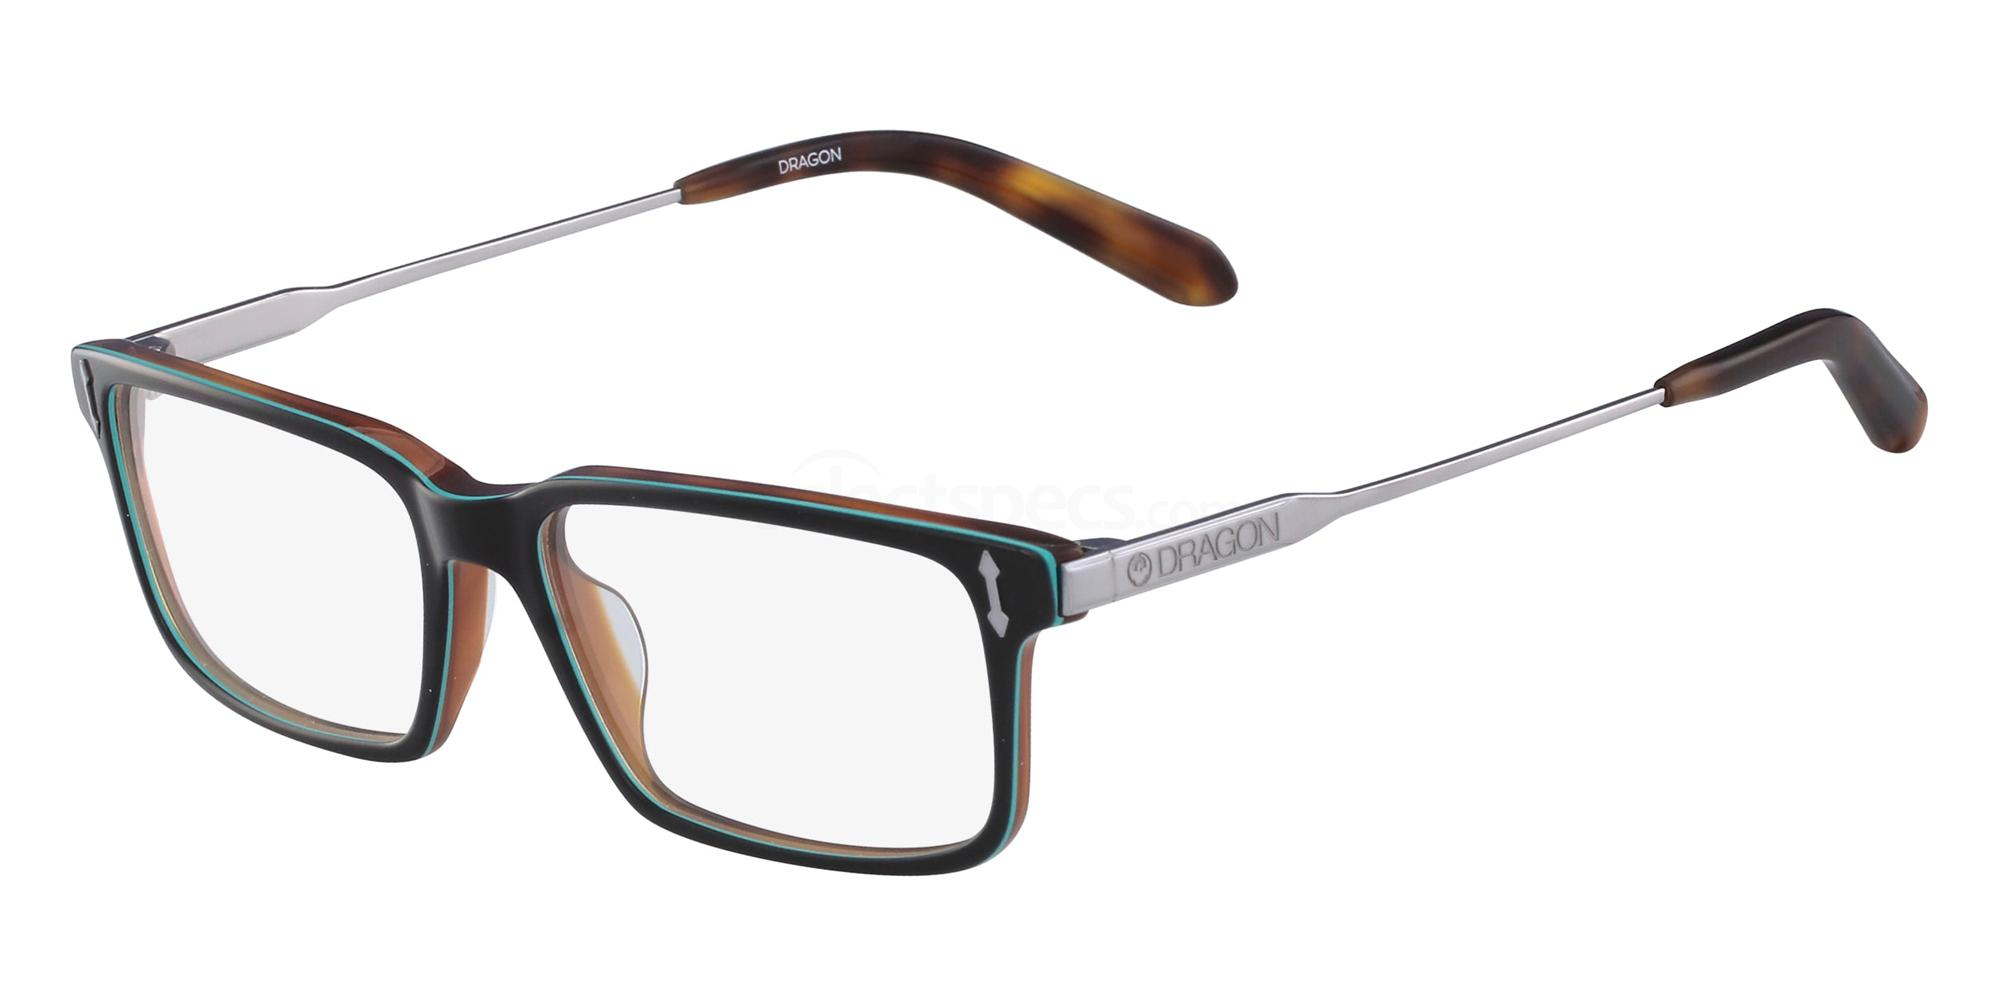 315 DR165 MAL Glasses, Dragon